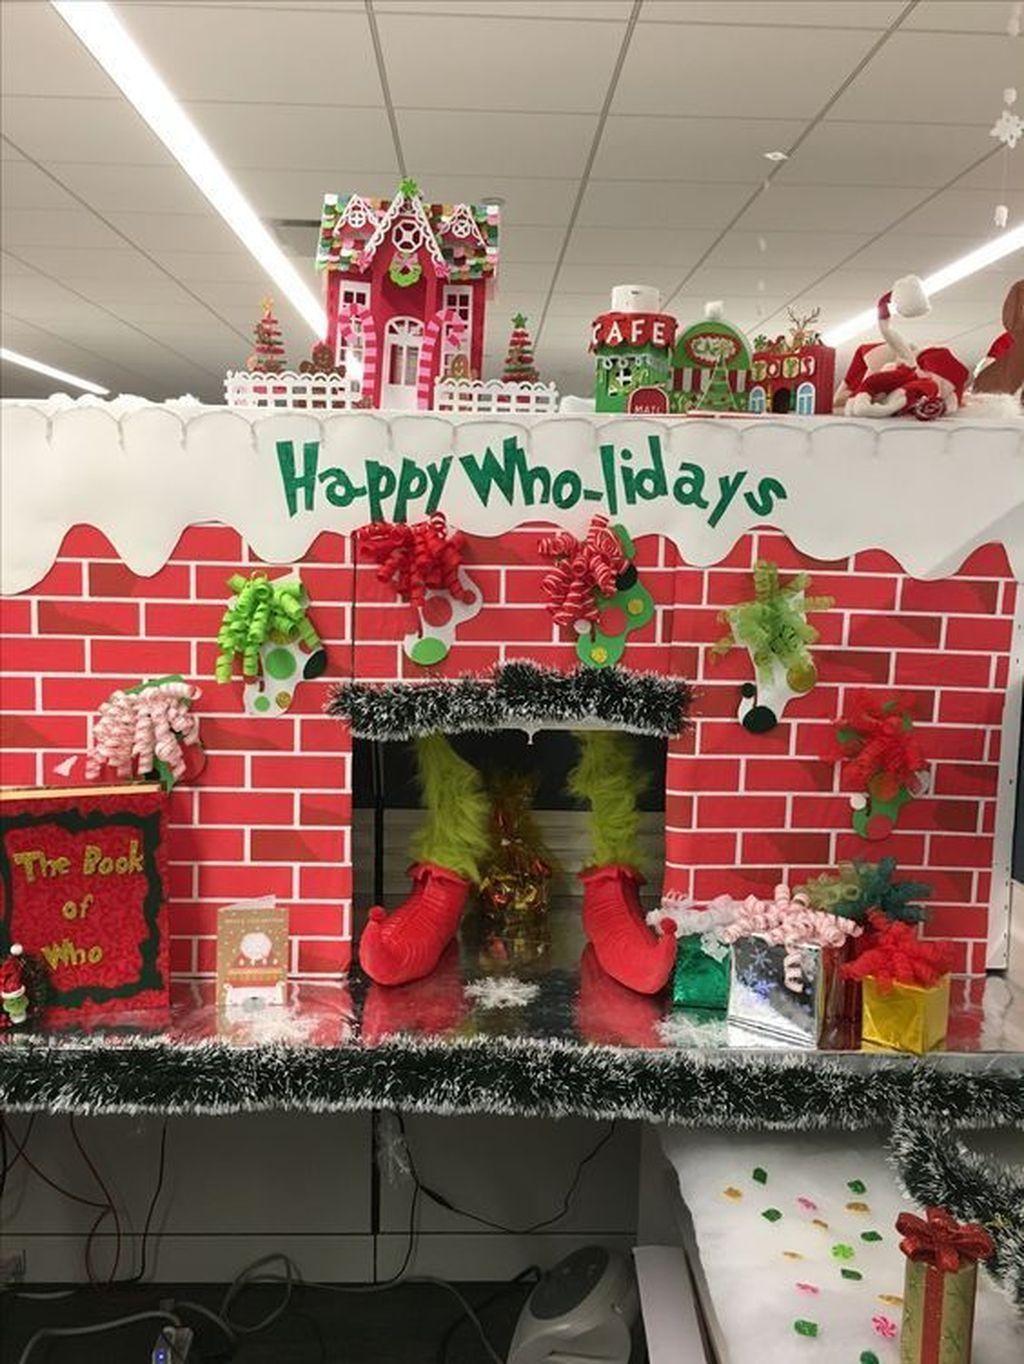 30 Latest Christmas Office Decoration Ideas You Should Try In 2020 Office Christmas Decorations Grinch Christmas Decorations Christmas Cubicle Decorations